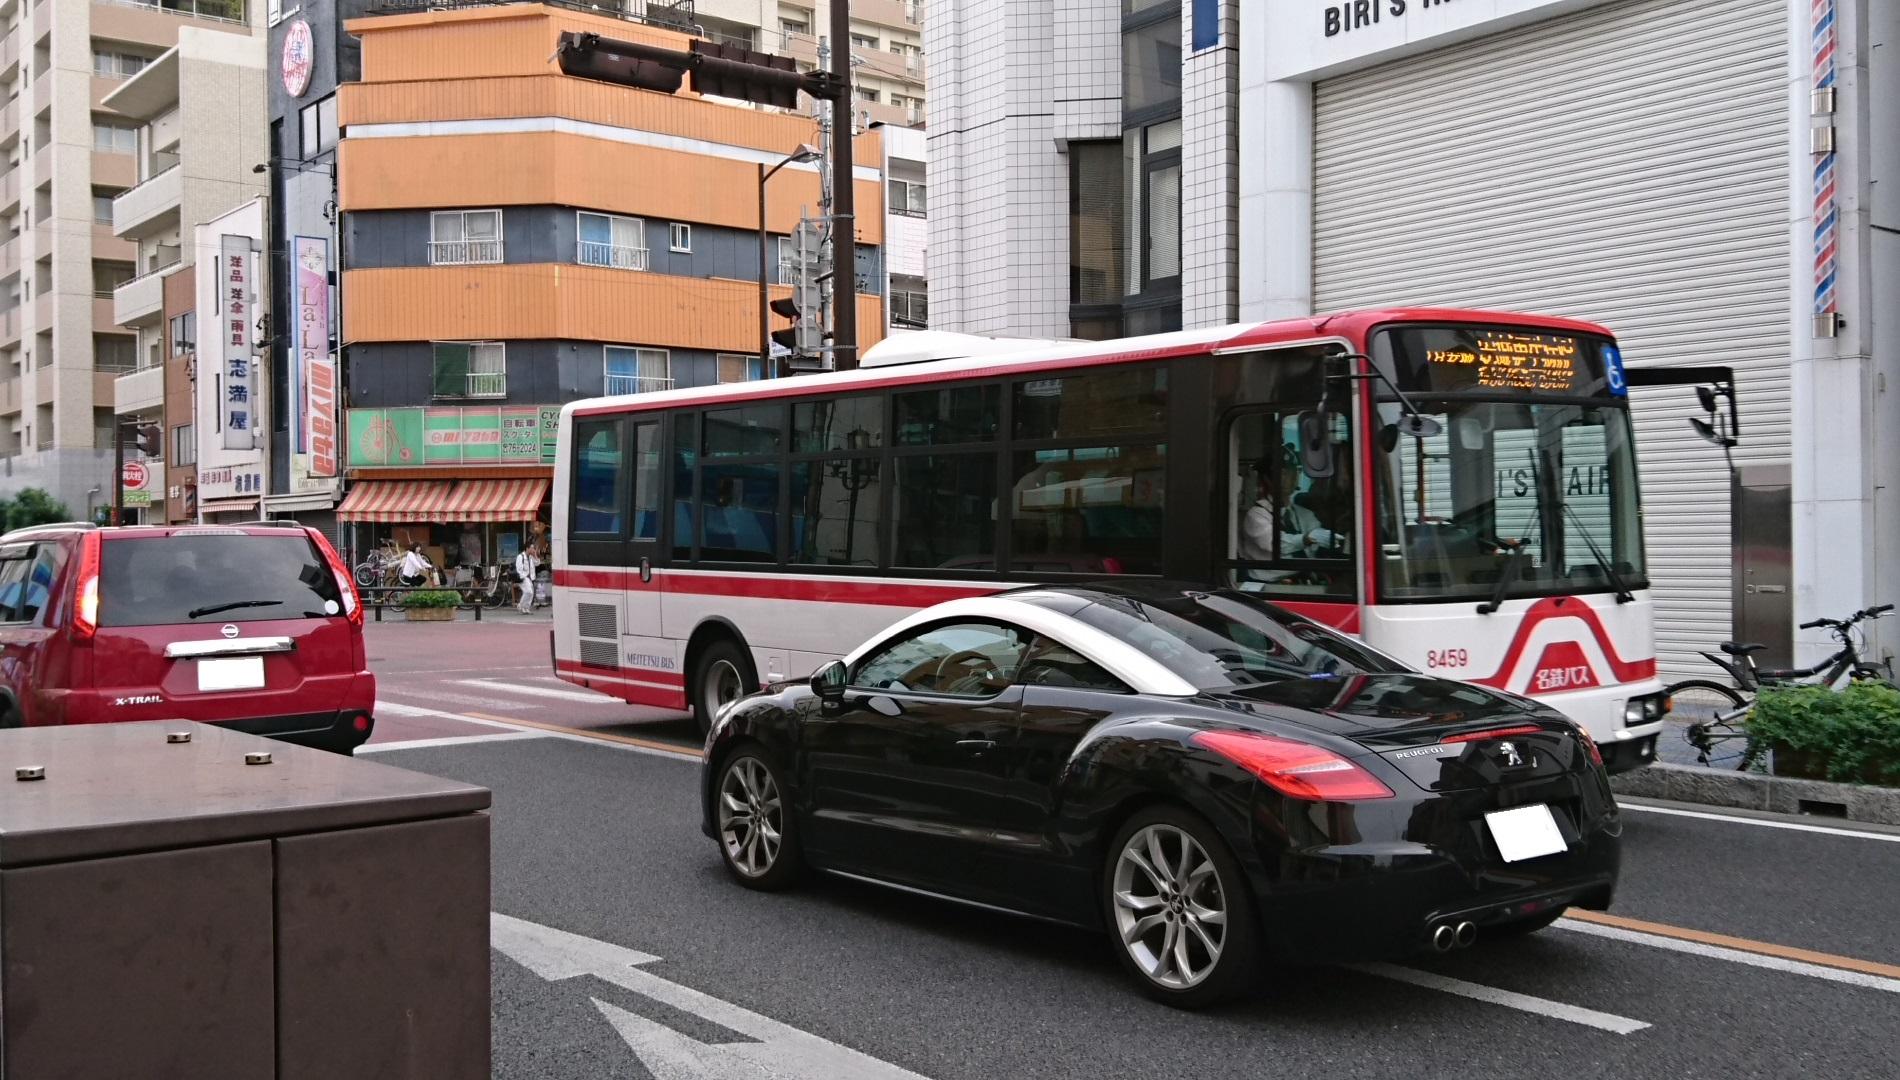 2016.10.21 07:53 御幸本町交差点 - 名鉄バス 1900-1080